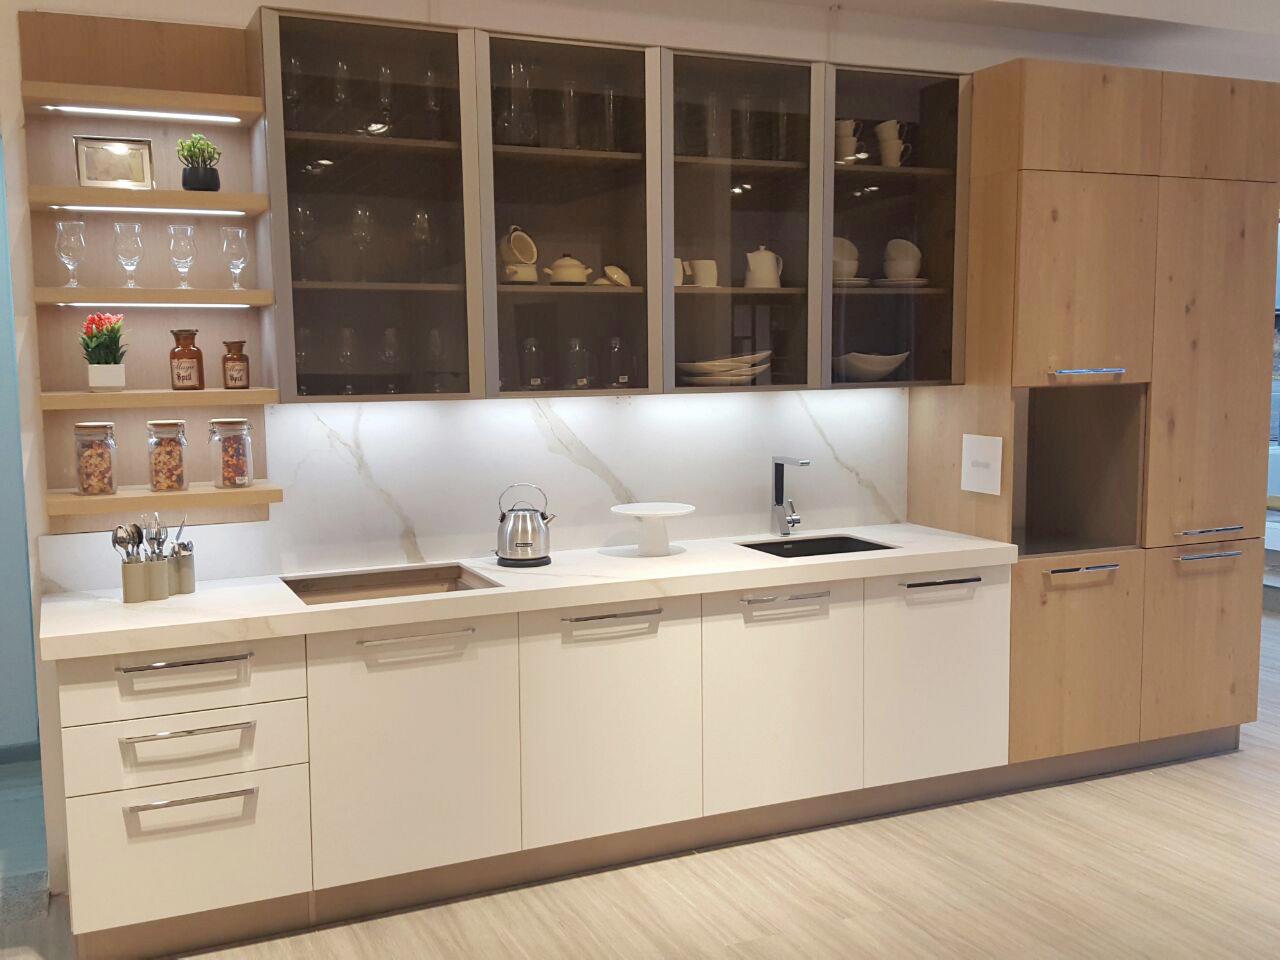 Cucine Lube opens in Costa Rica - Home Appliances World